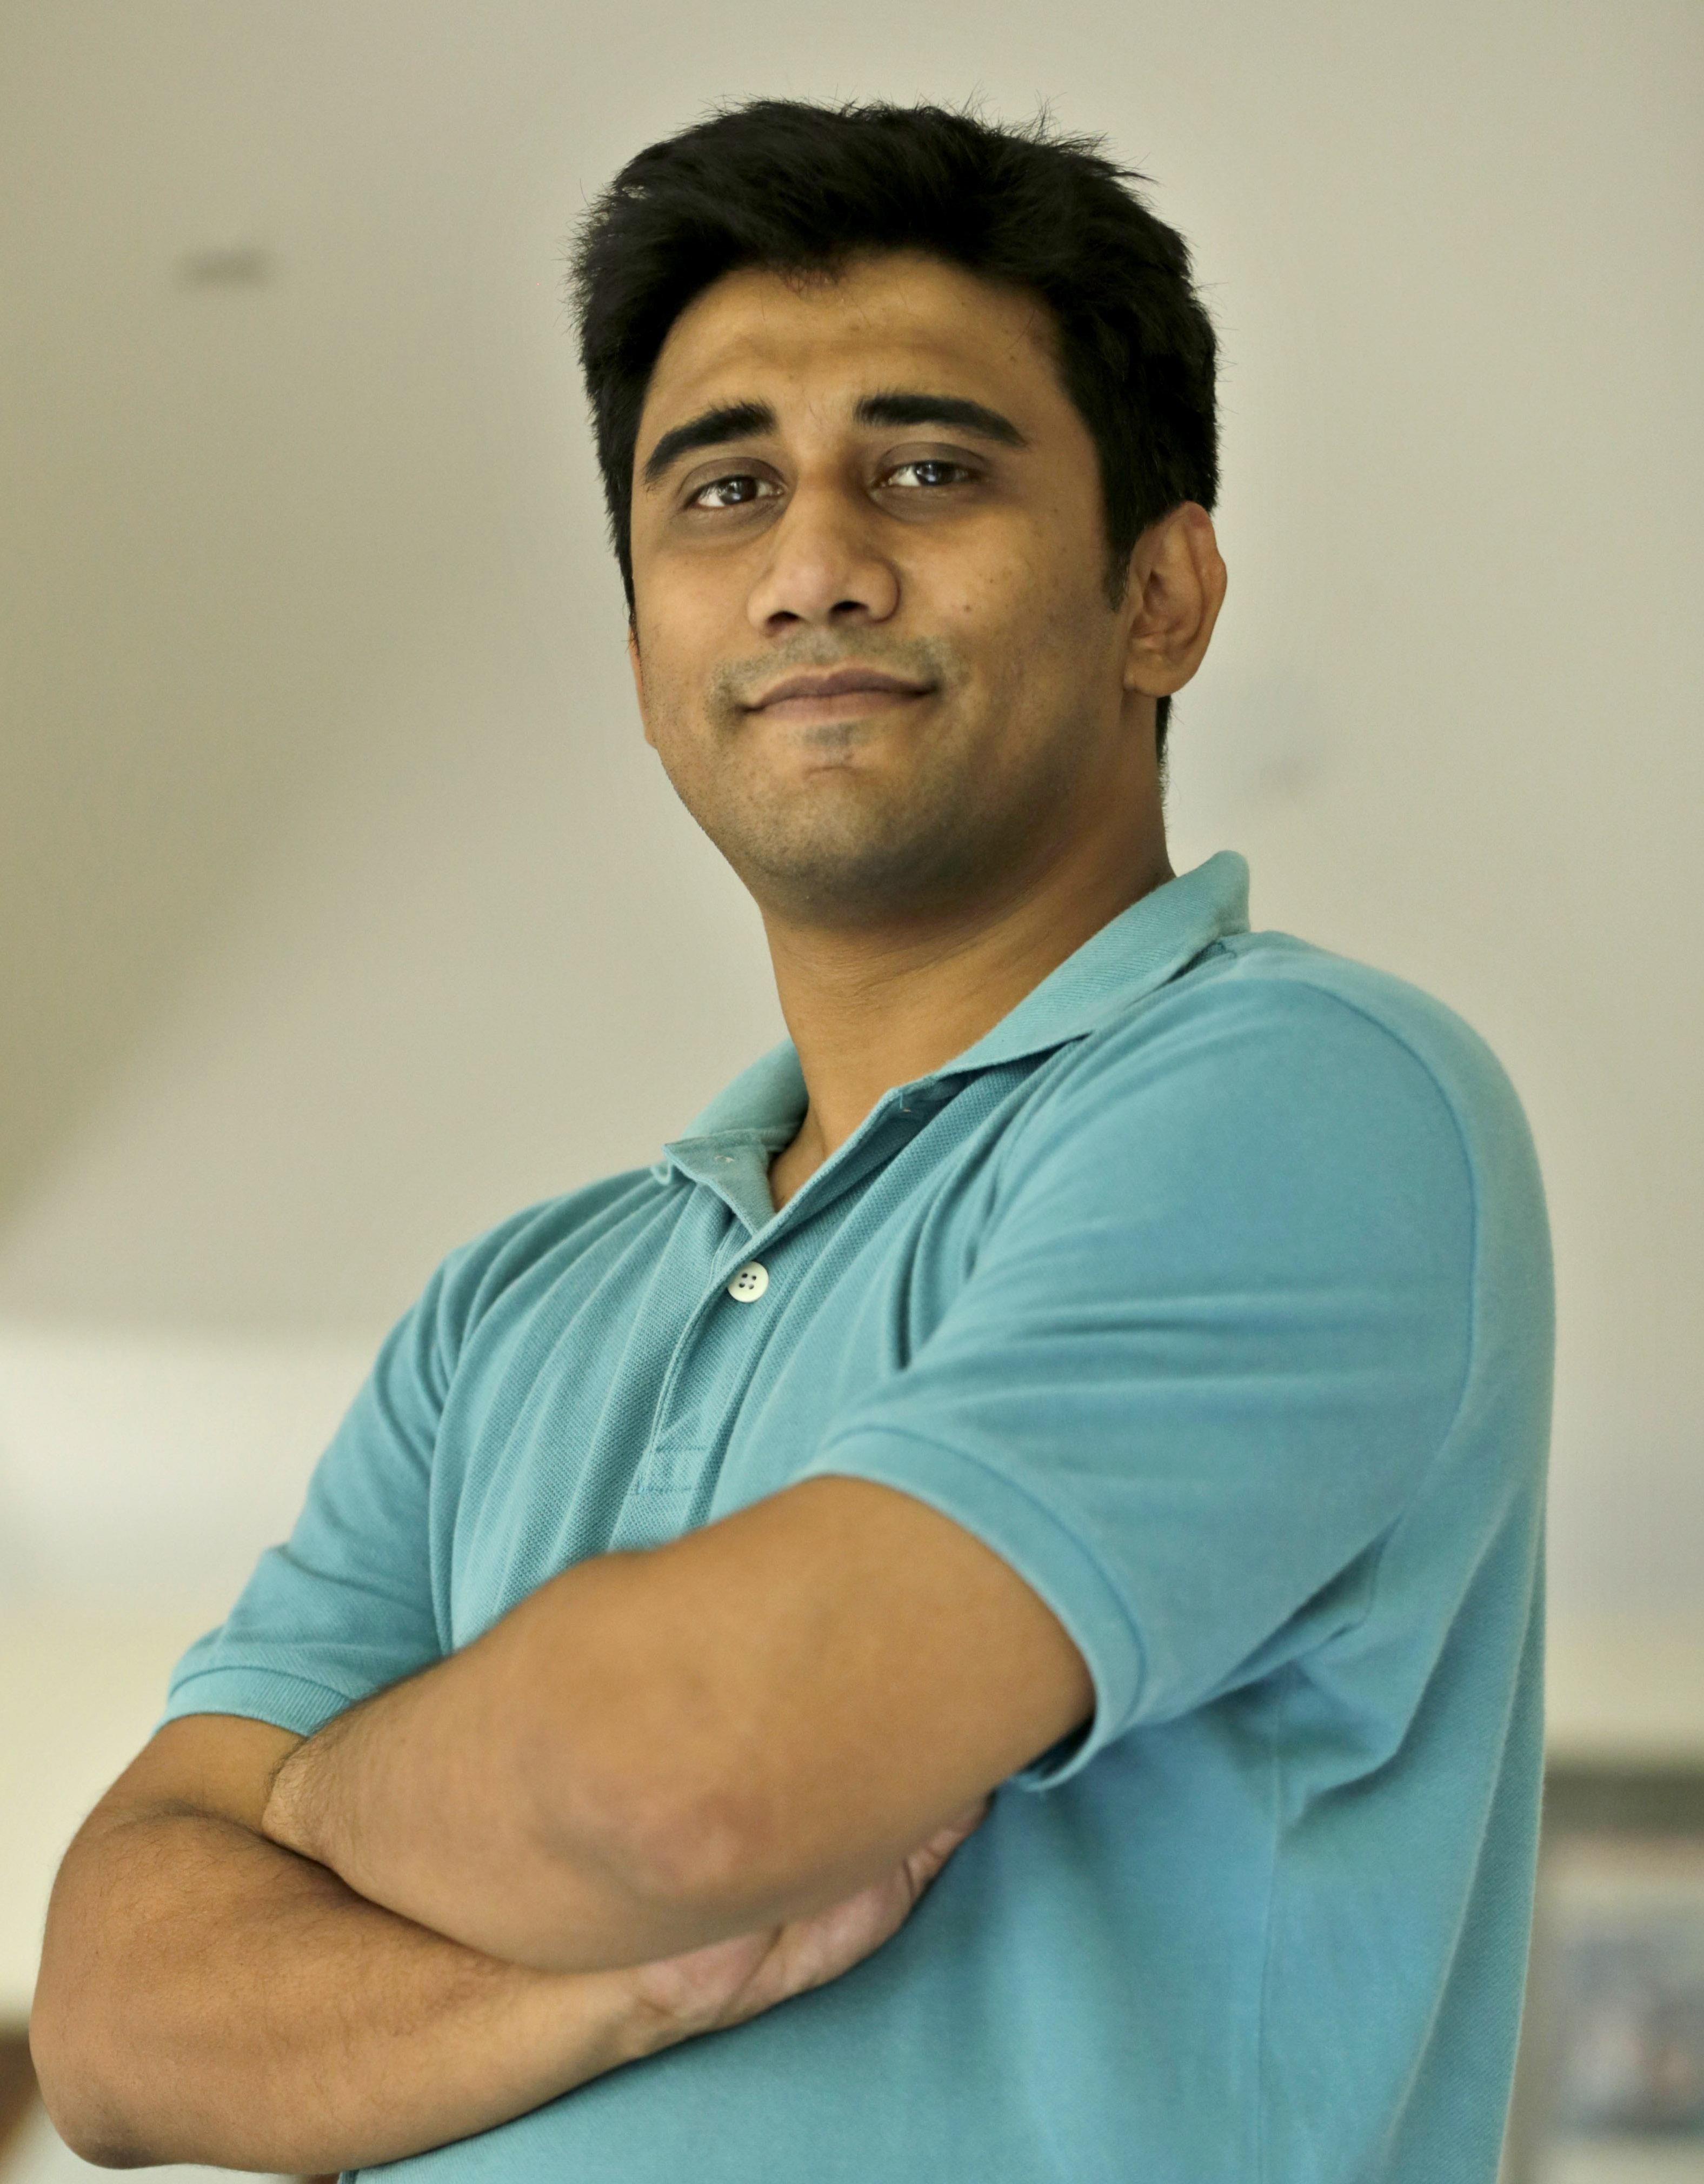 Rajit Sengupta